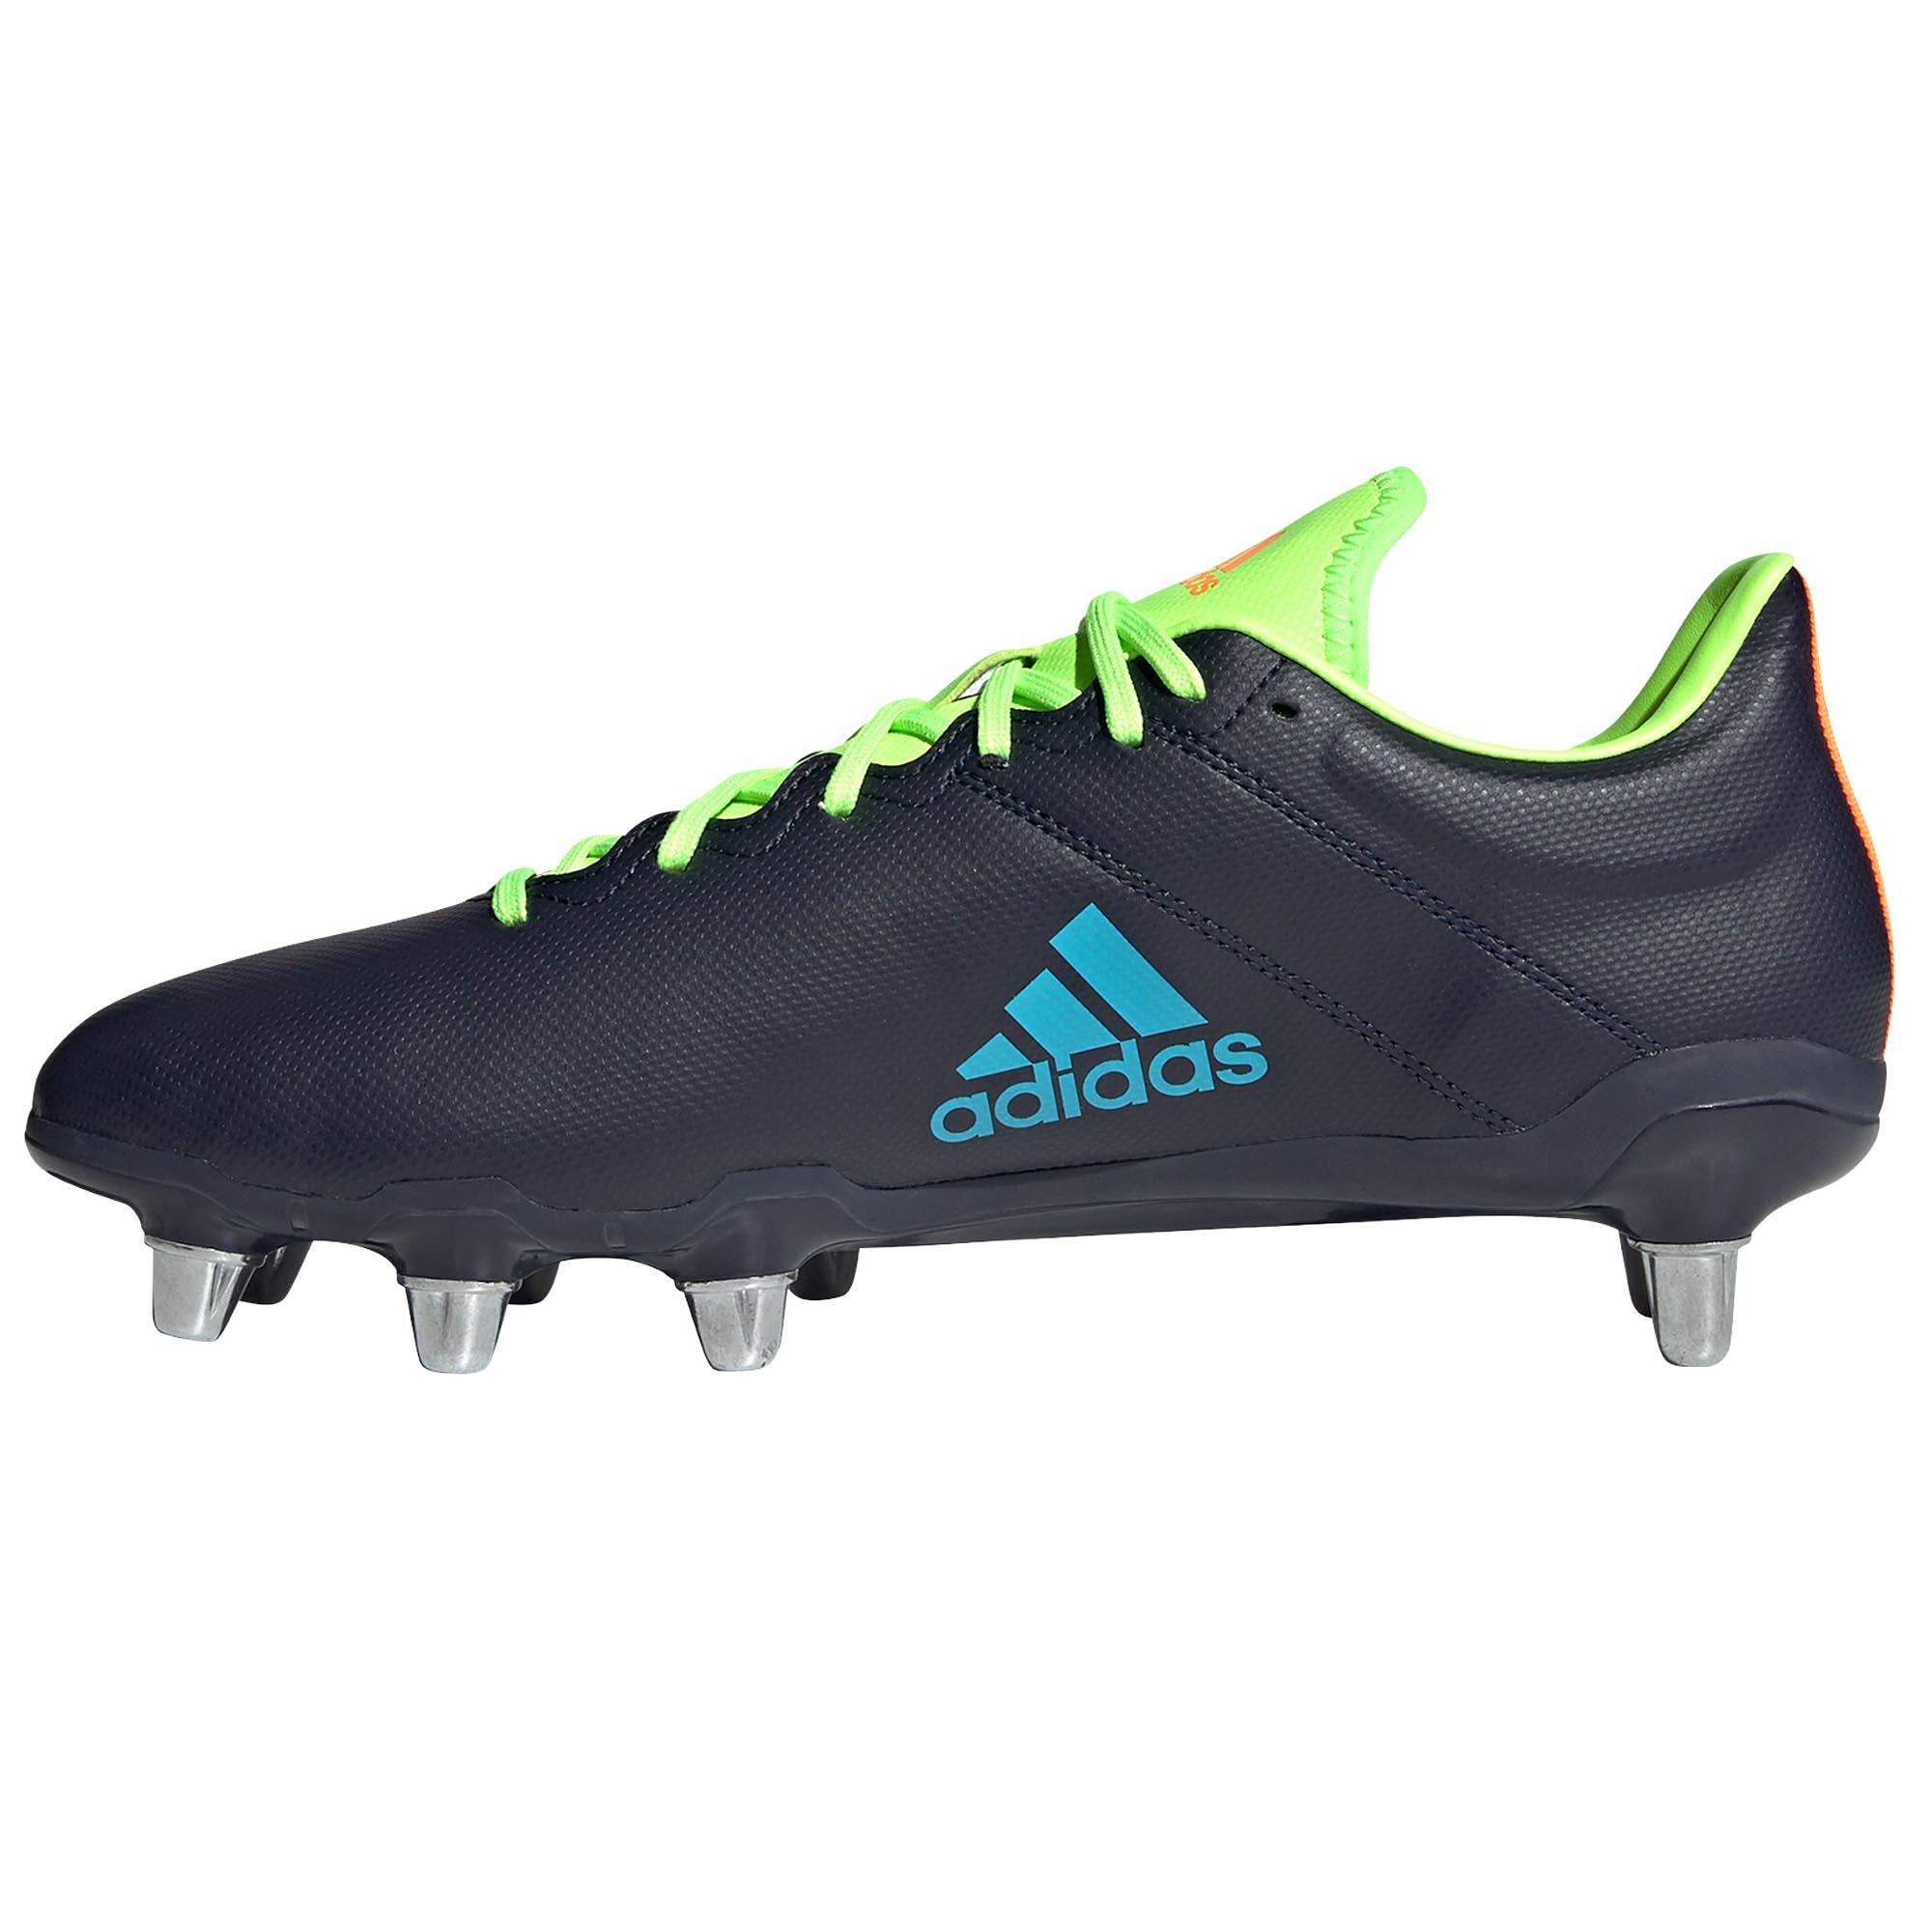 miniature 7 - Adidas Kakari SG Soft Ground pour homme Rugby Union Boot bleu marine/vert